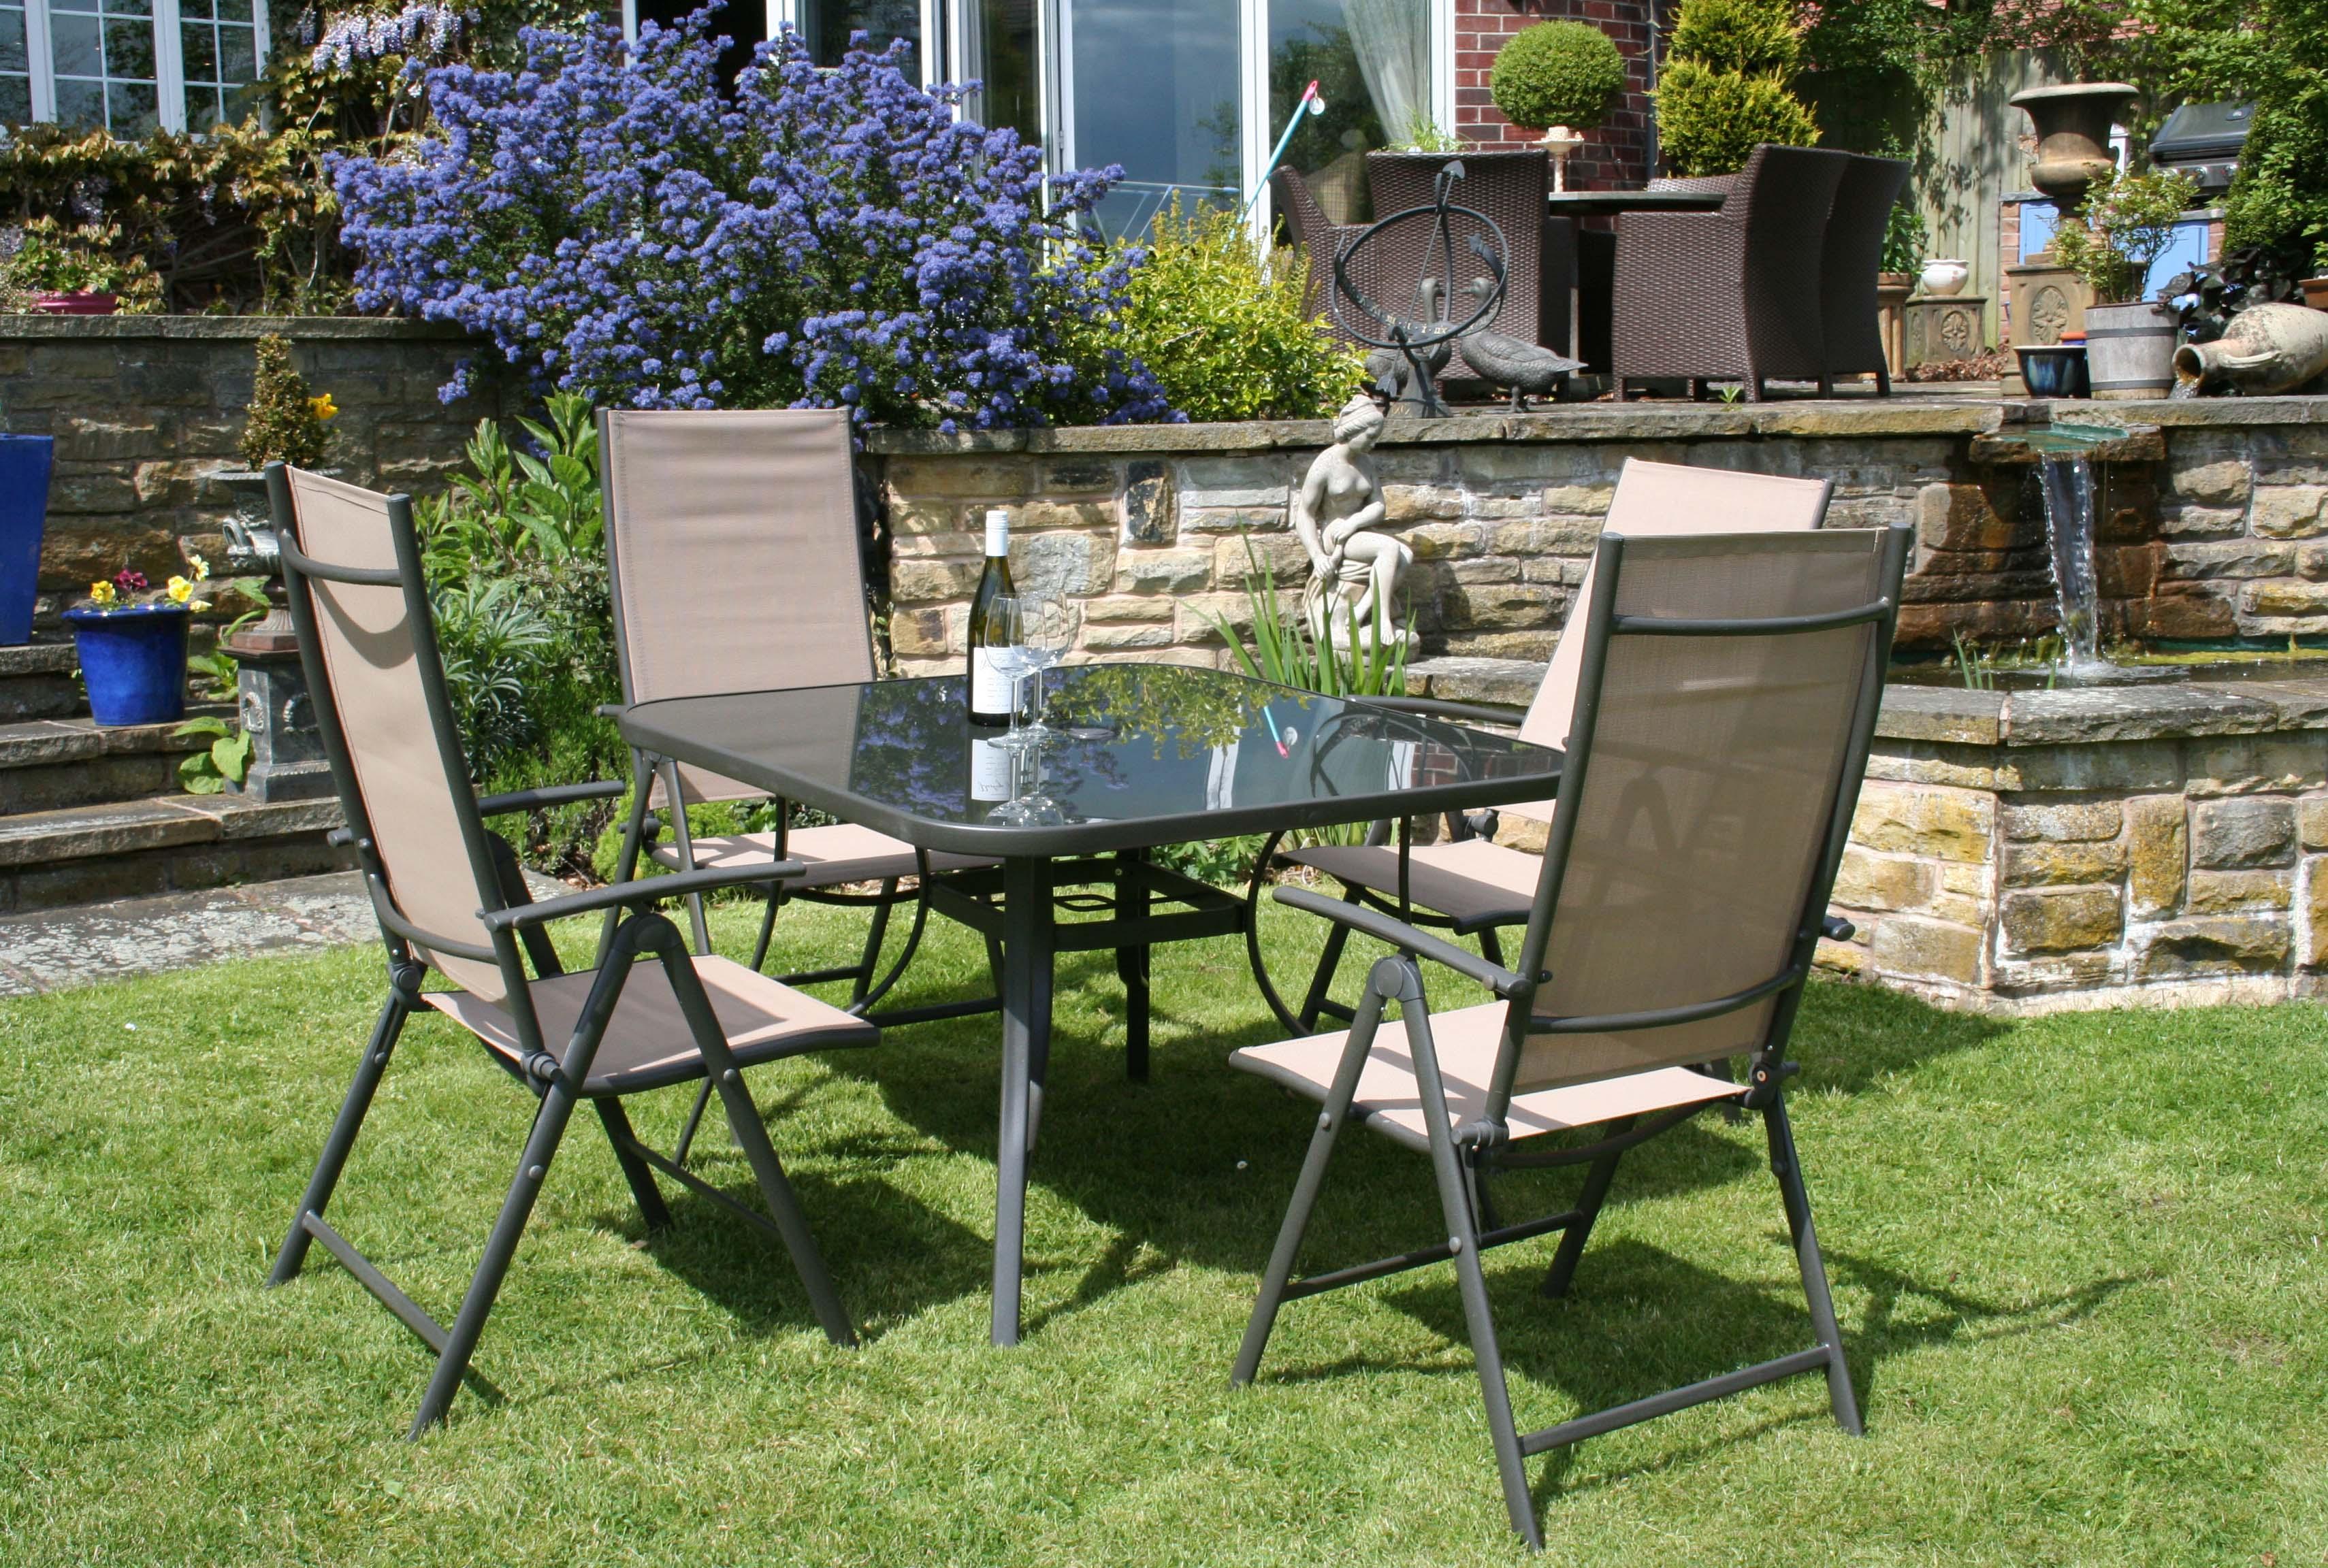 Metal garden furniture sets   Metal Textilene Garden Patio Furniture 5  Piece Table Chairs Set Beige. Metal Garden Furniture Sets